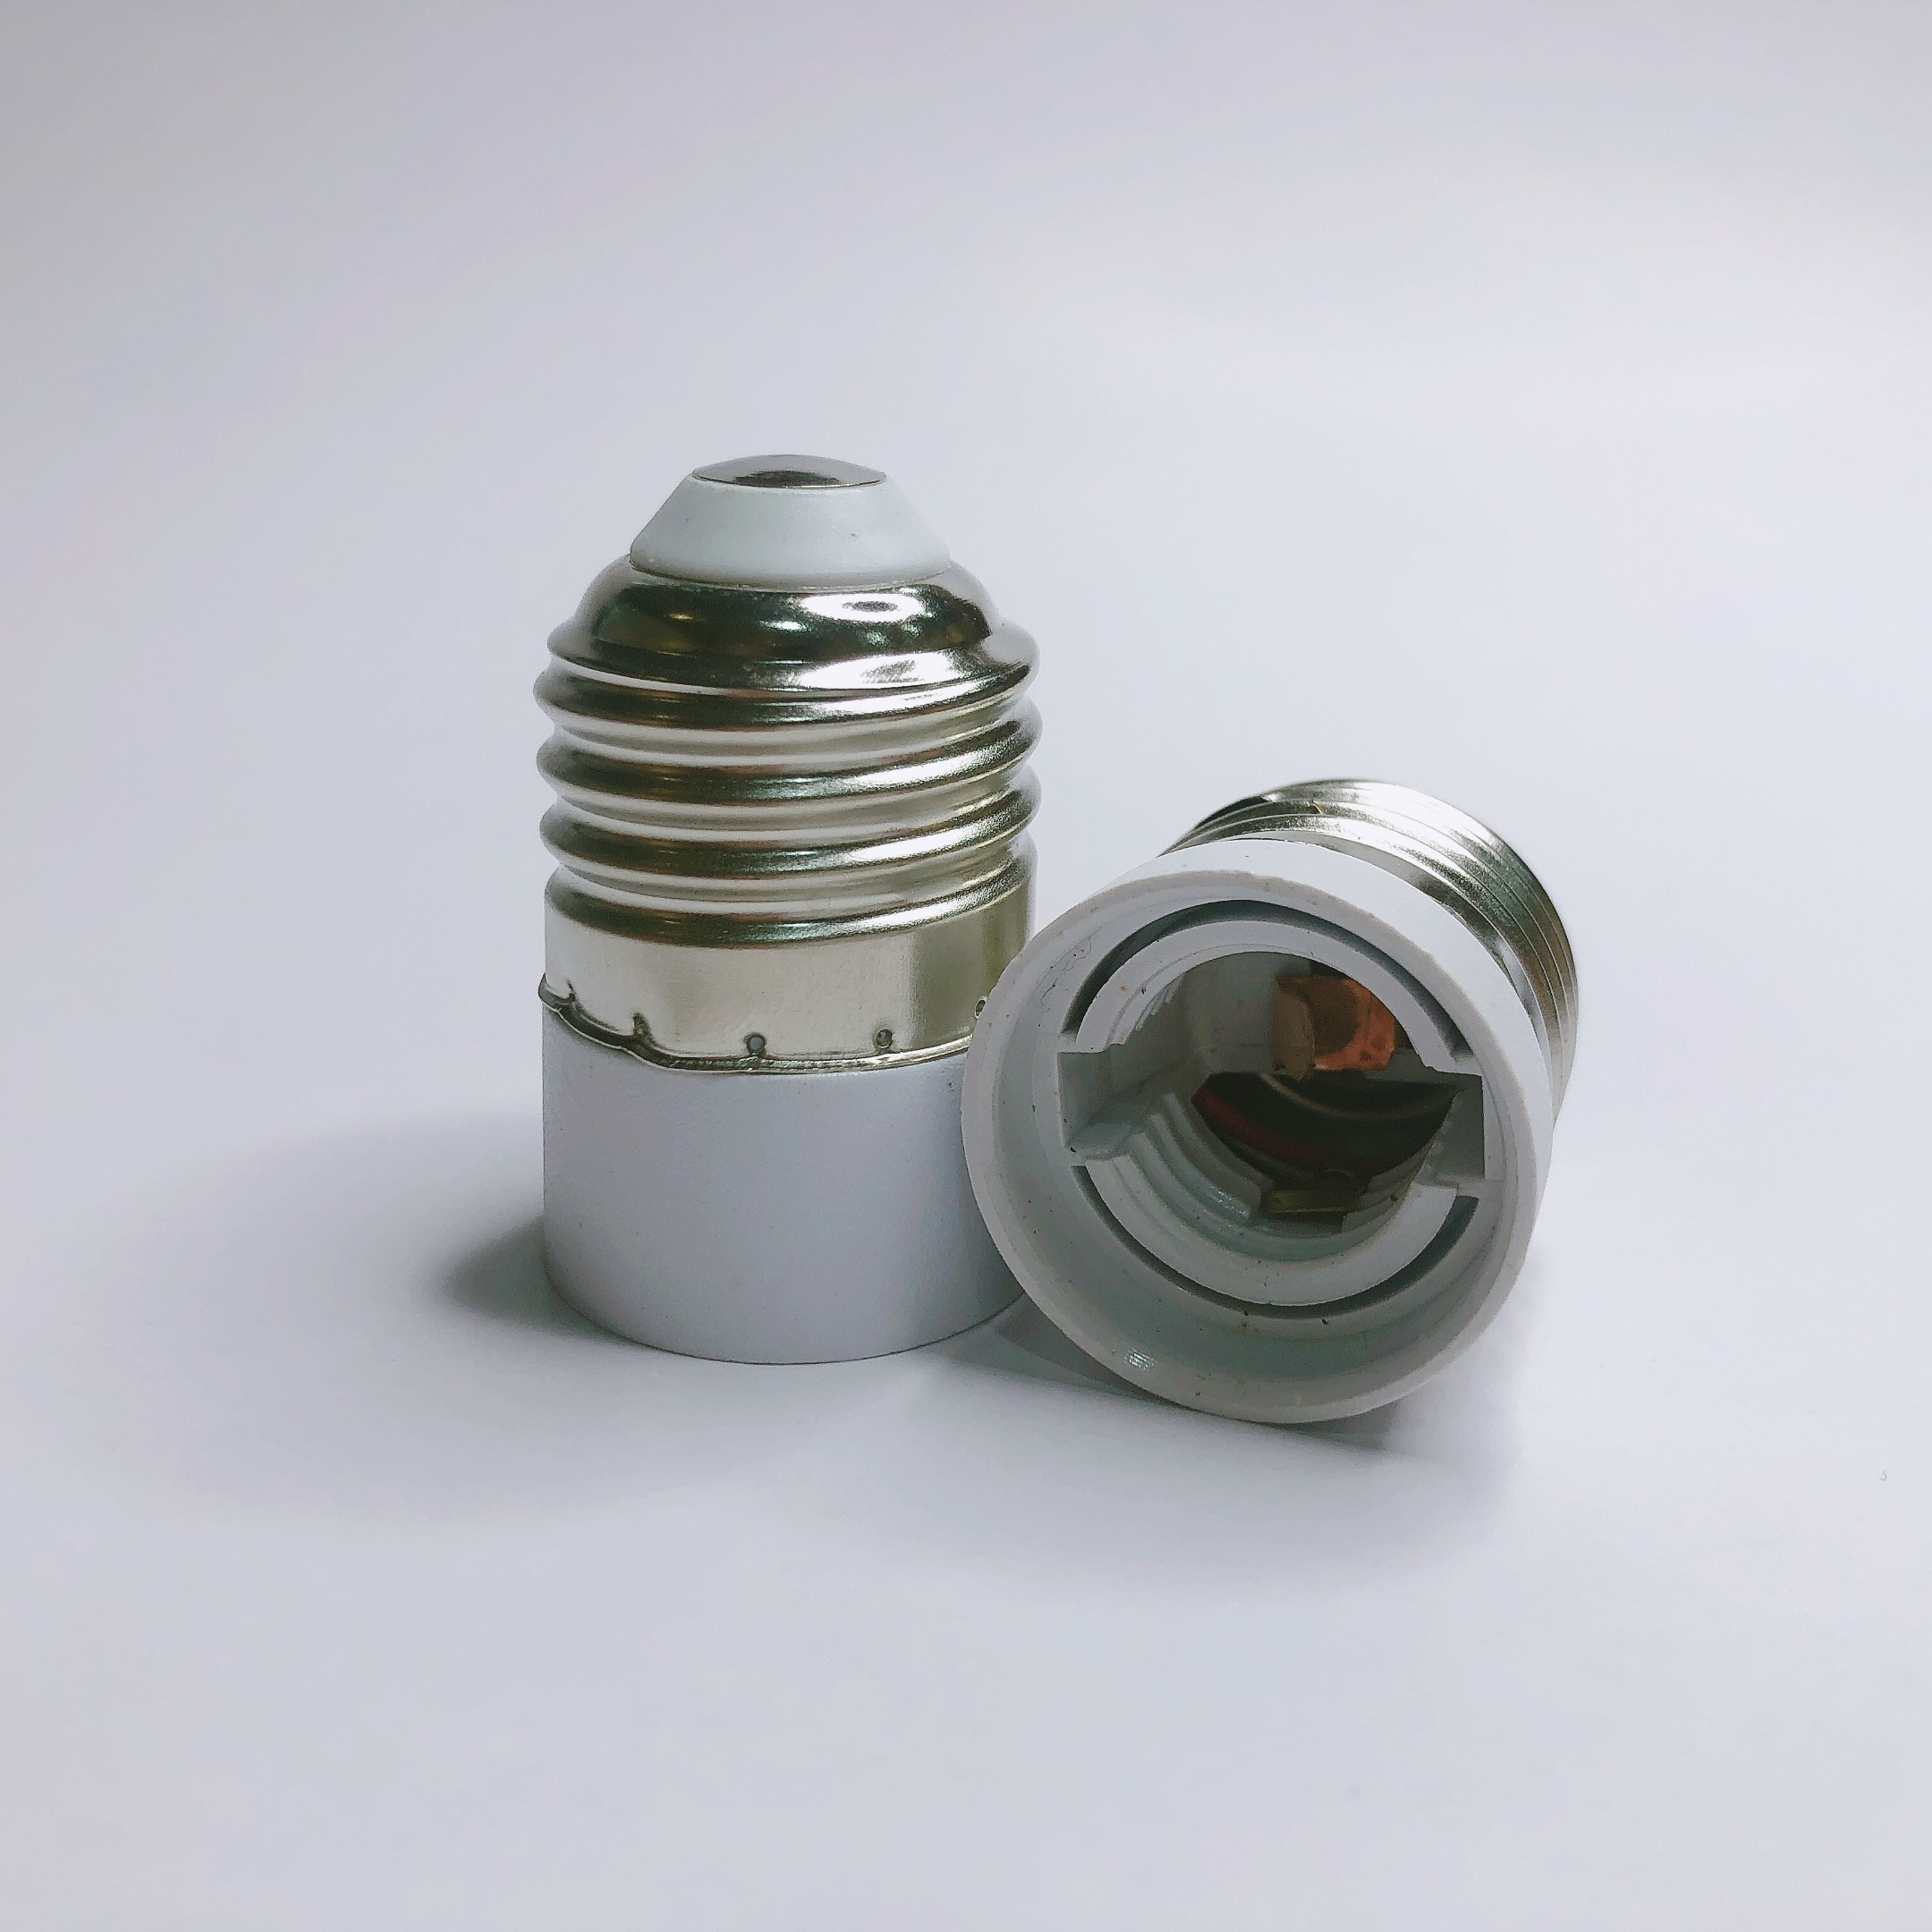 BEYLSION Converter E27 TO E14 Adapter Conversion Socket ABS Material Fireproof Socket Adapter Lamp Holder